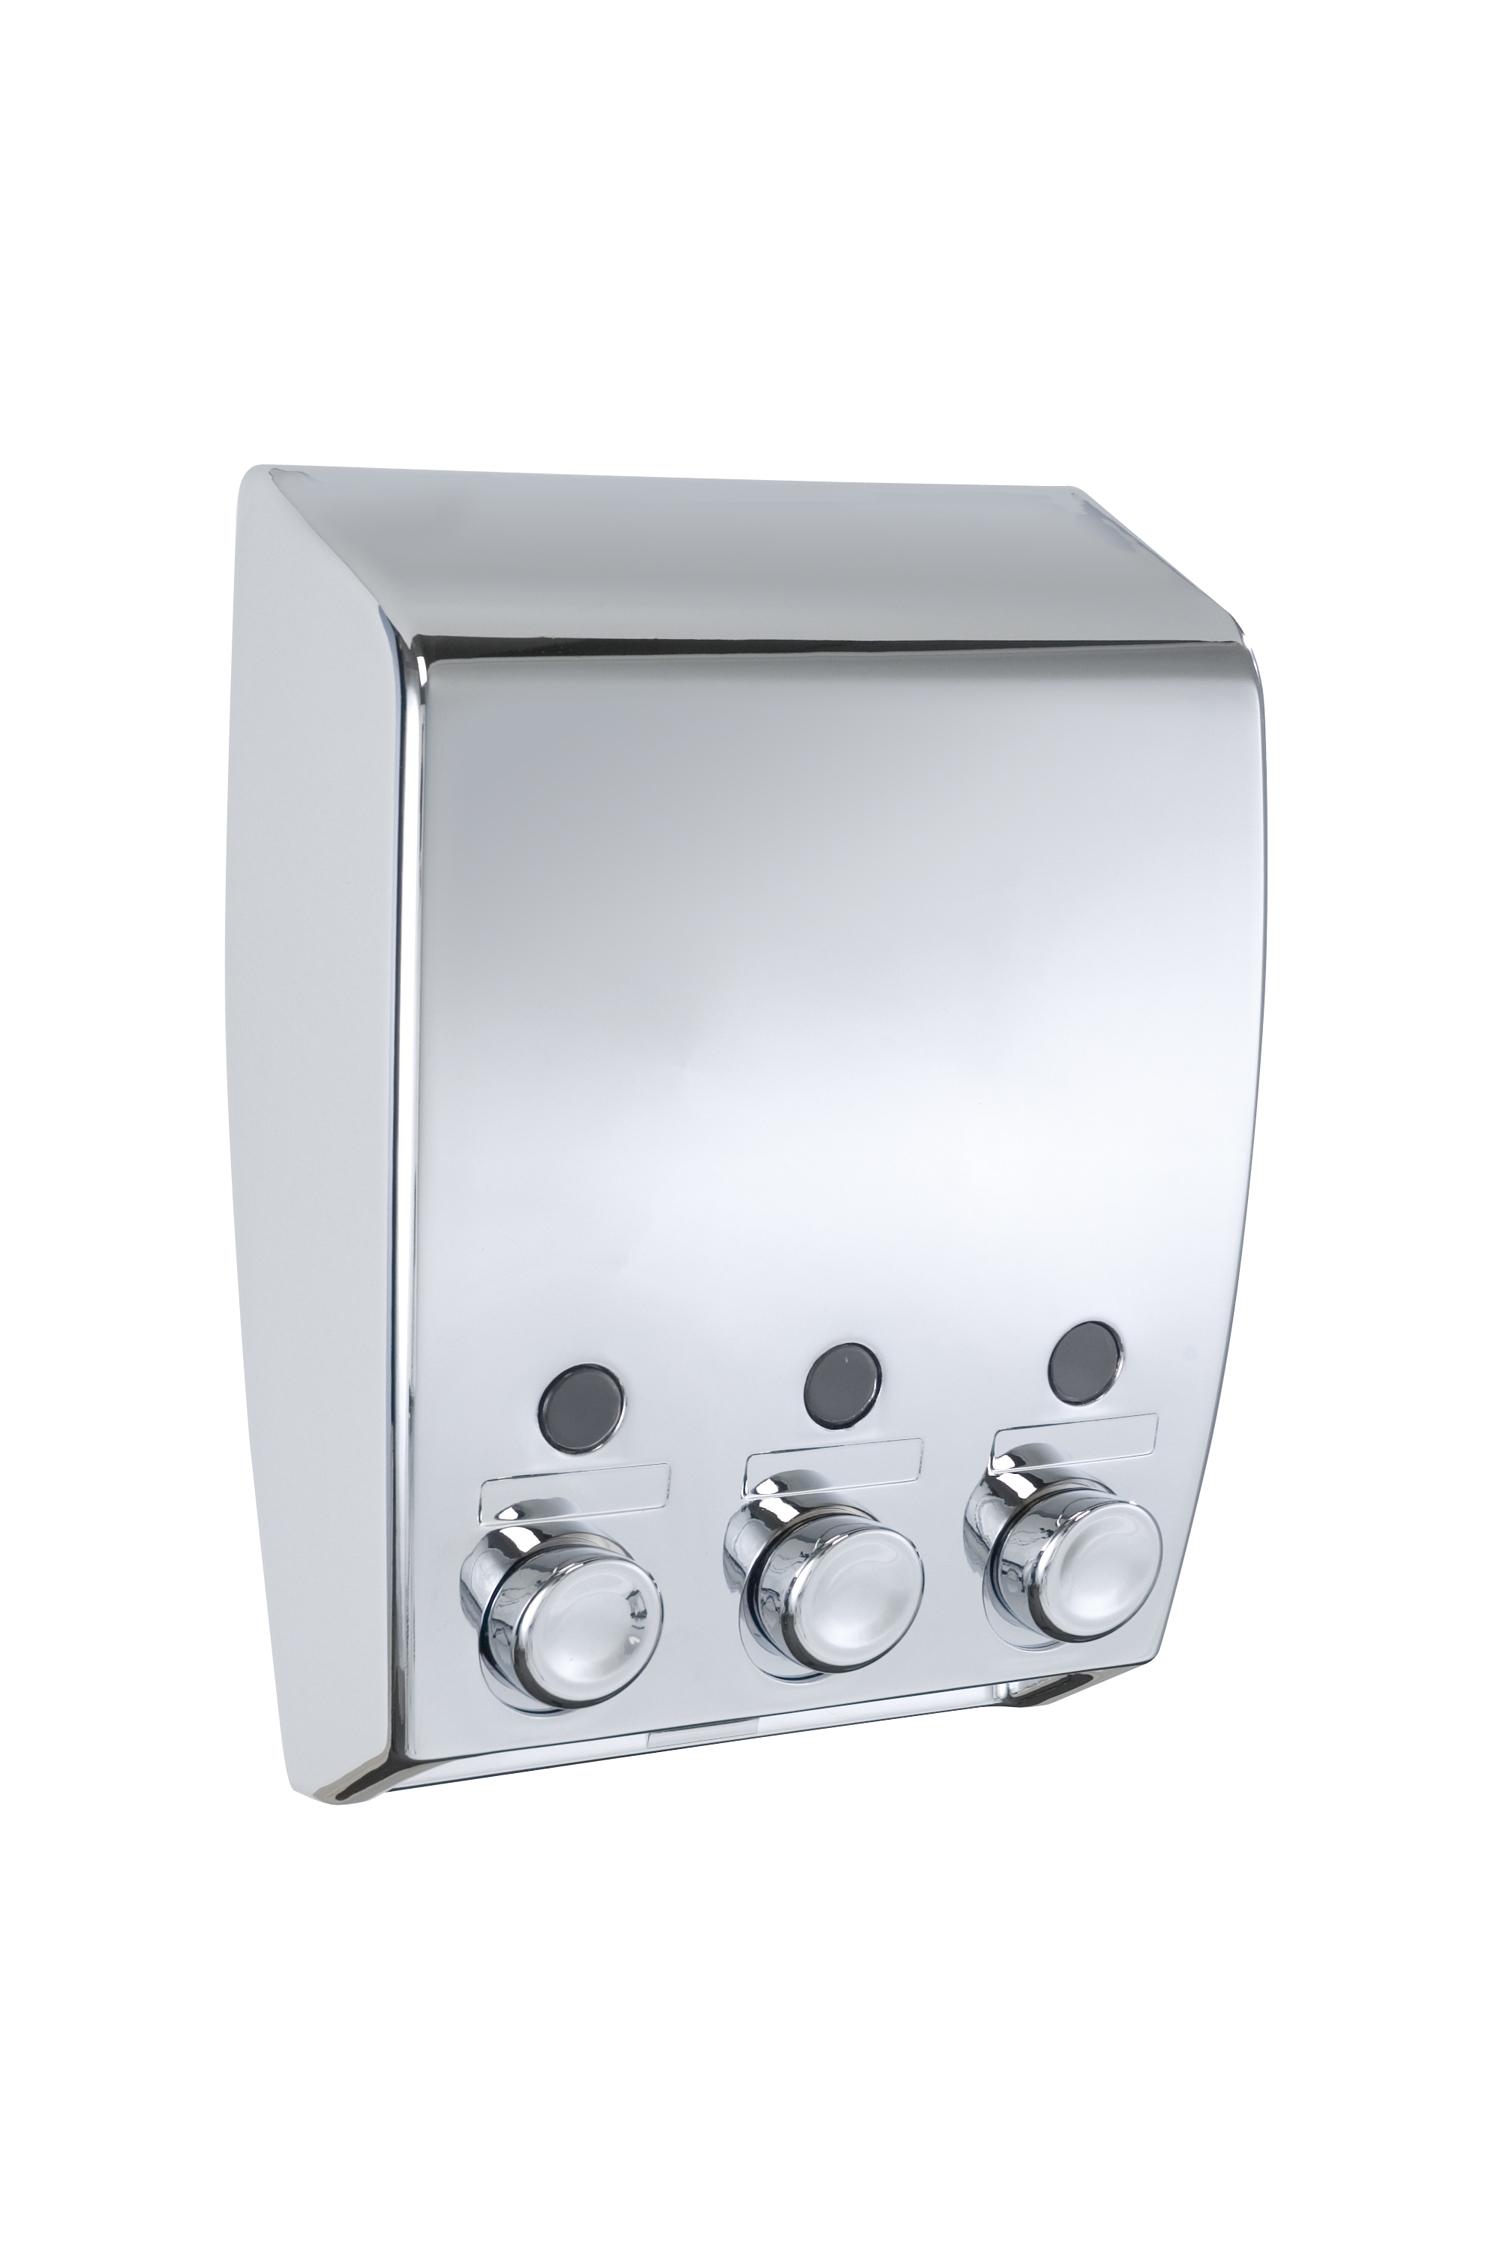 Wenko chrome varese wall mounted triple soap dispenser 19 - Distributeur savon douche mural ...